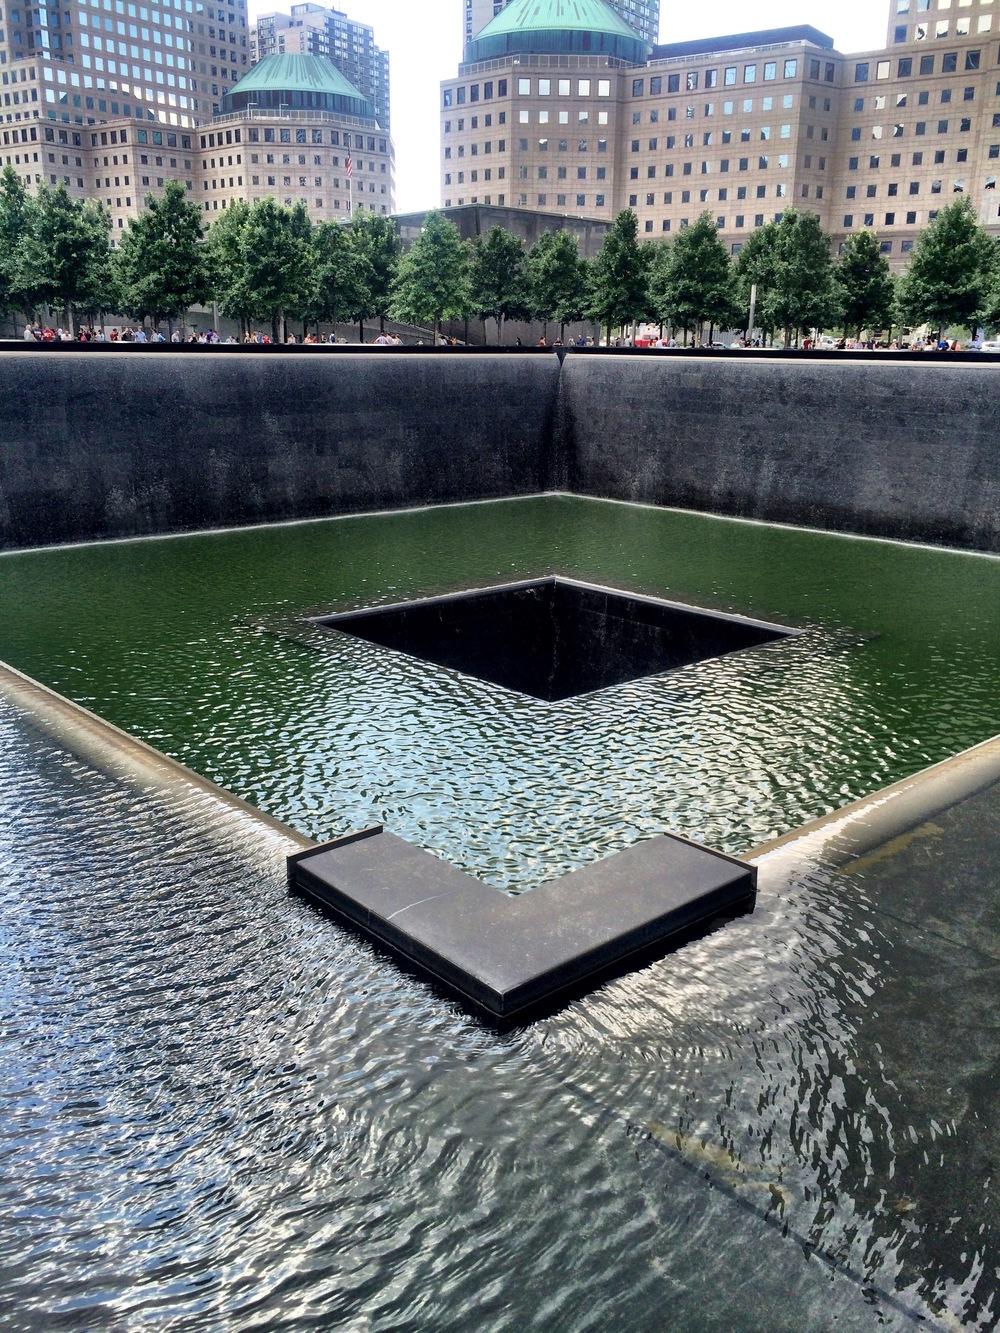 9.11 Memorial. Free in NYC